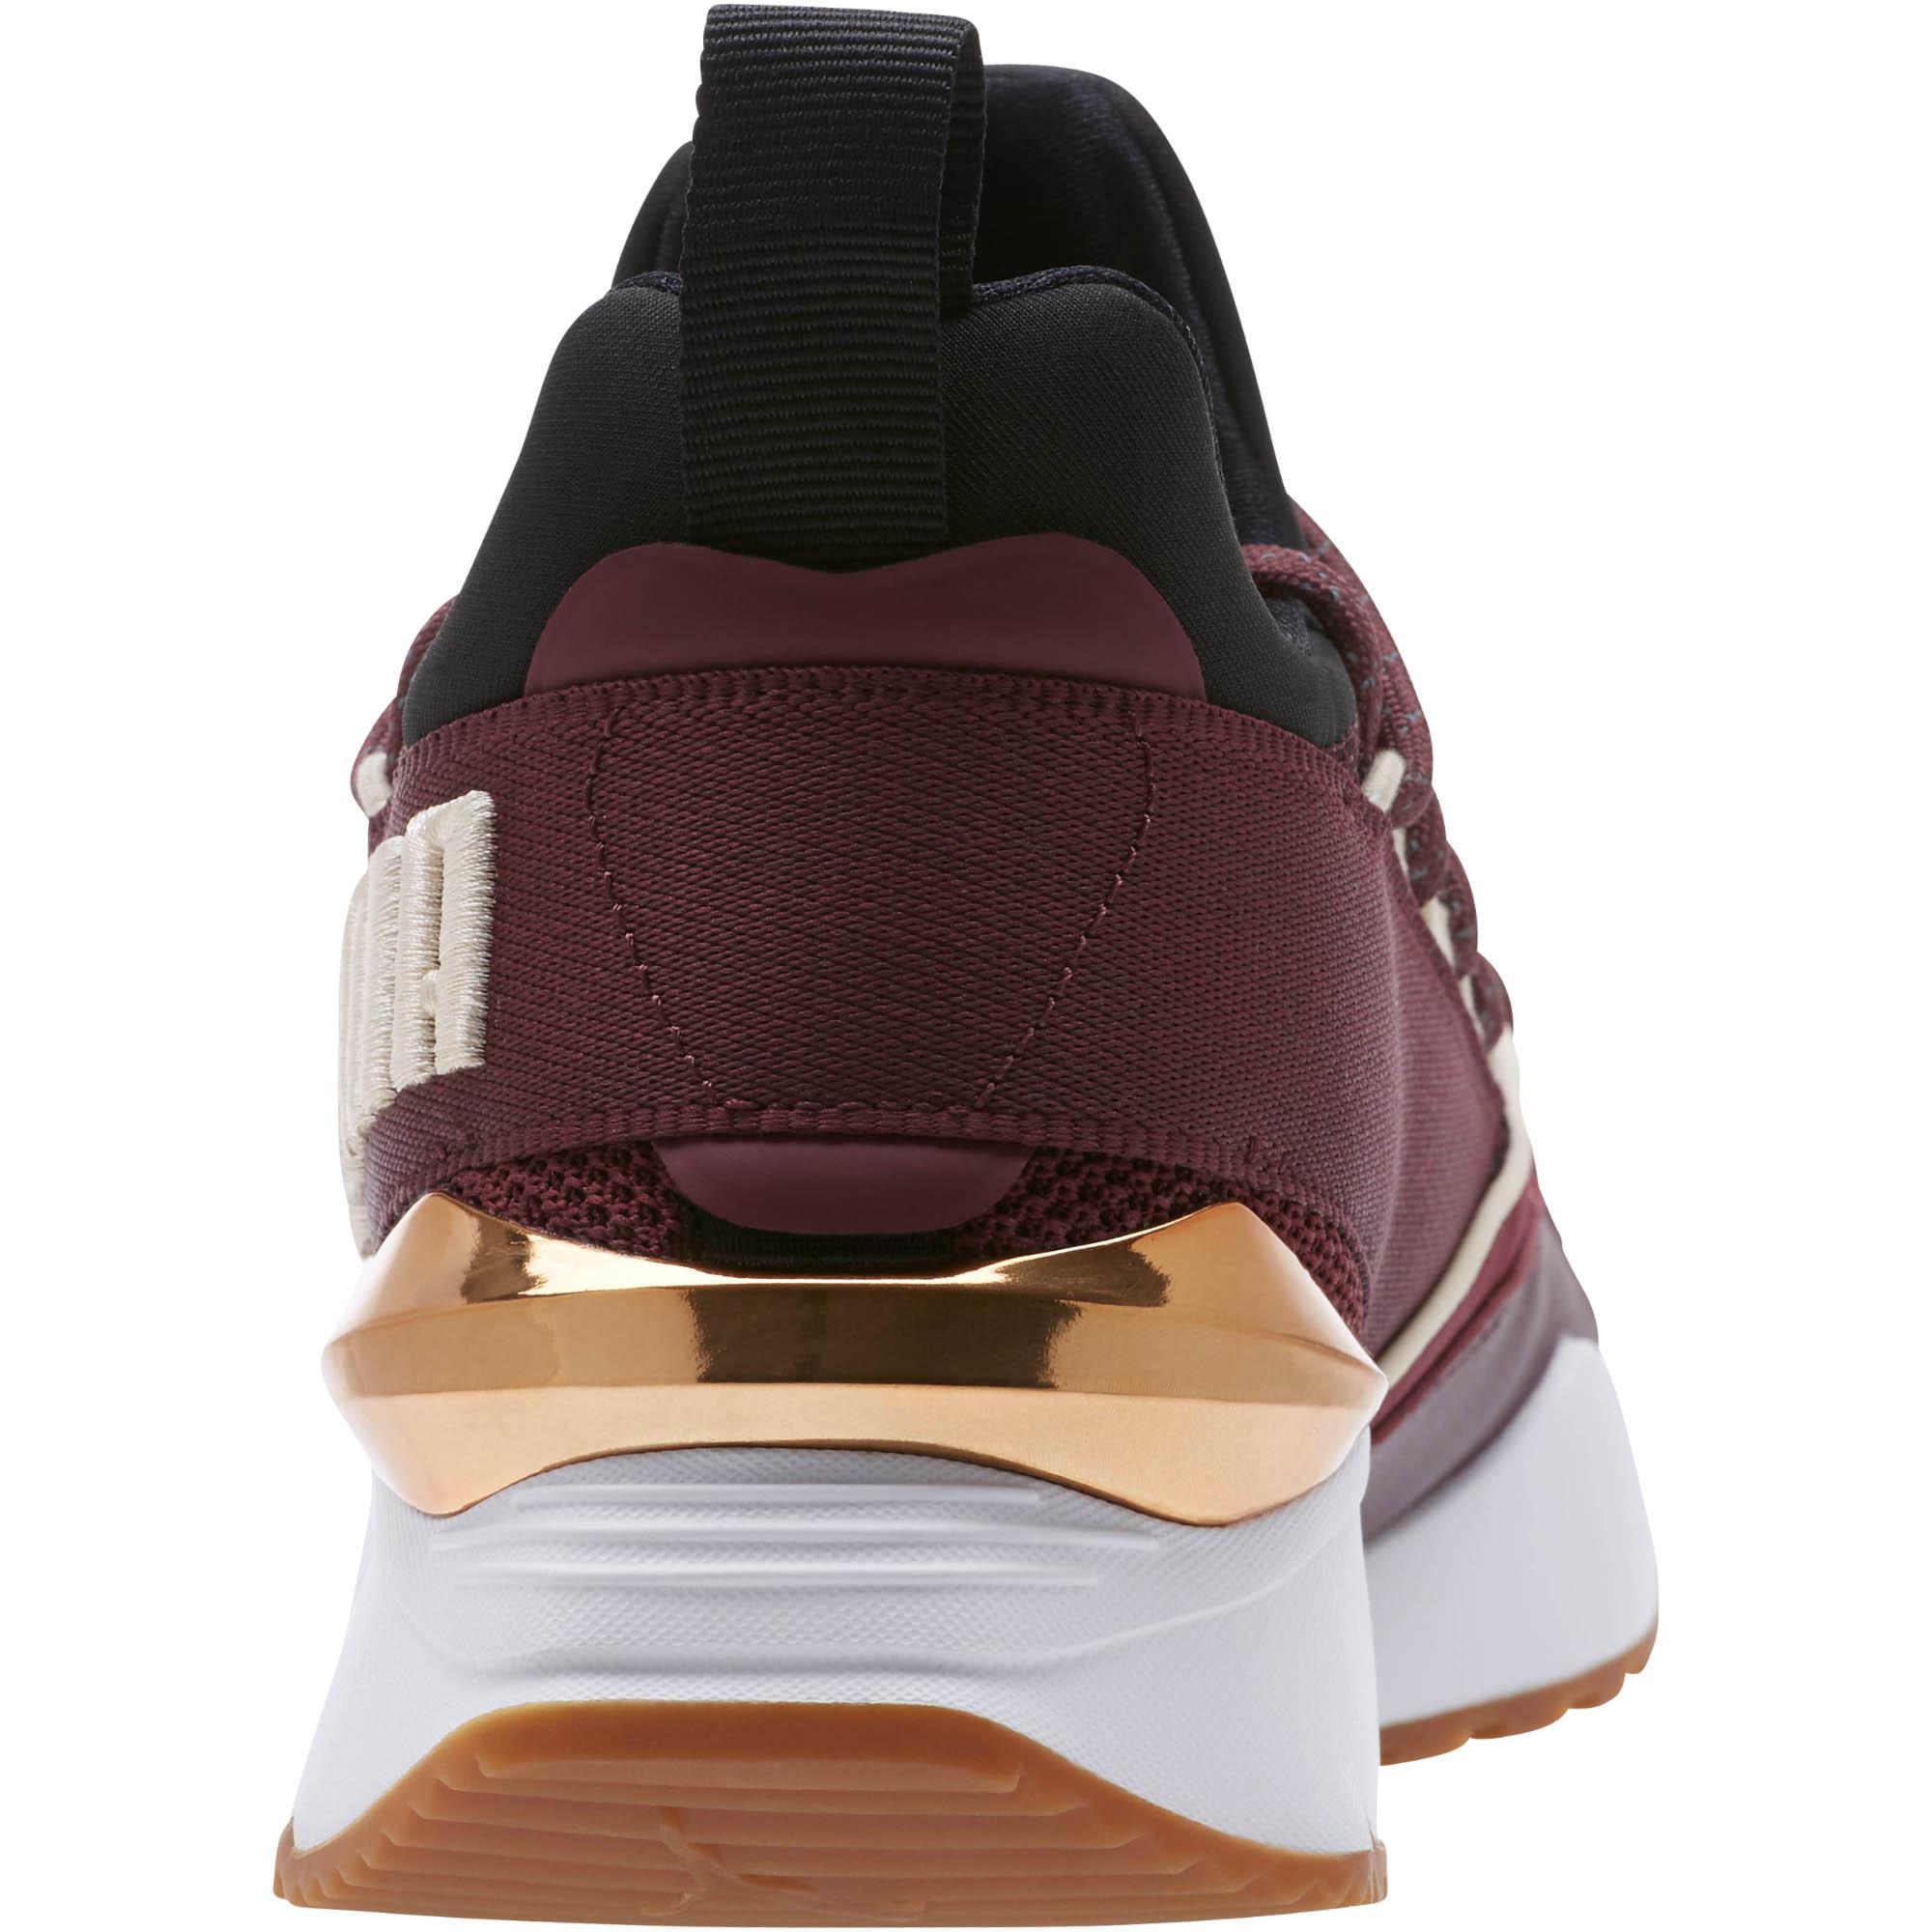 Lyst Puma Sneakers Muse Maia Smet Damens's Sneakers Puma f1306f